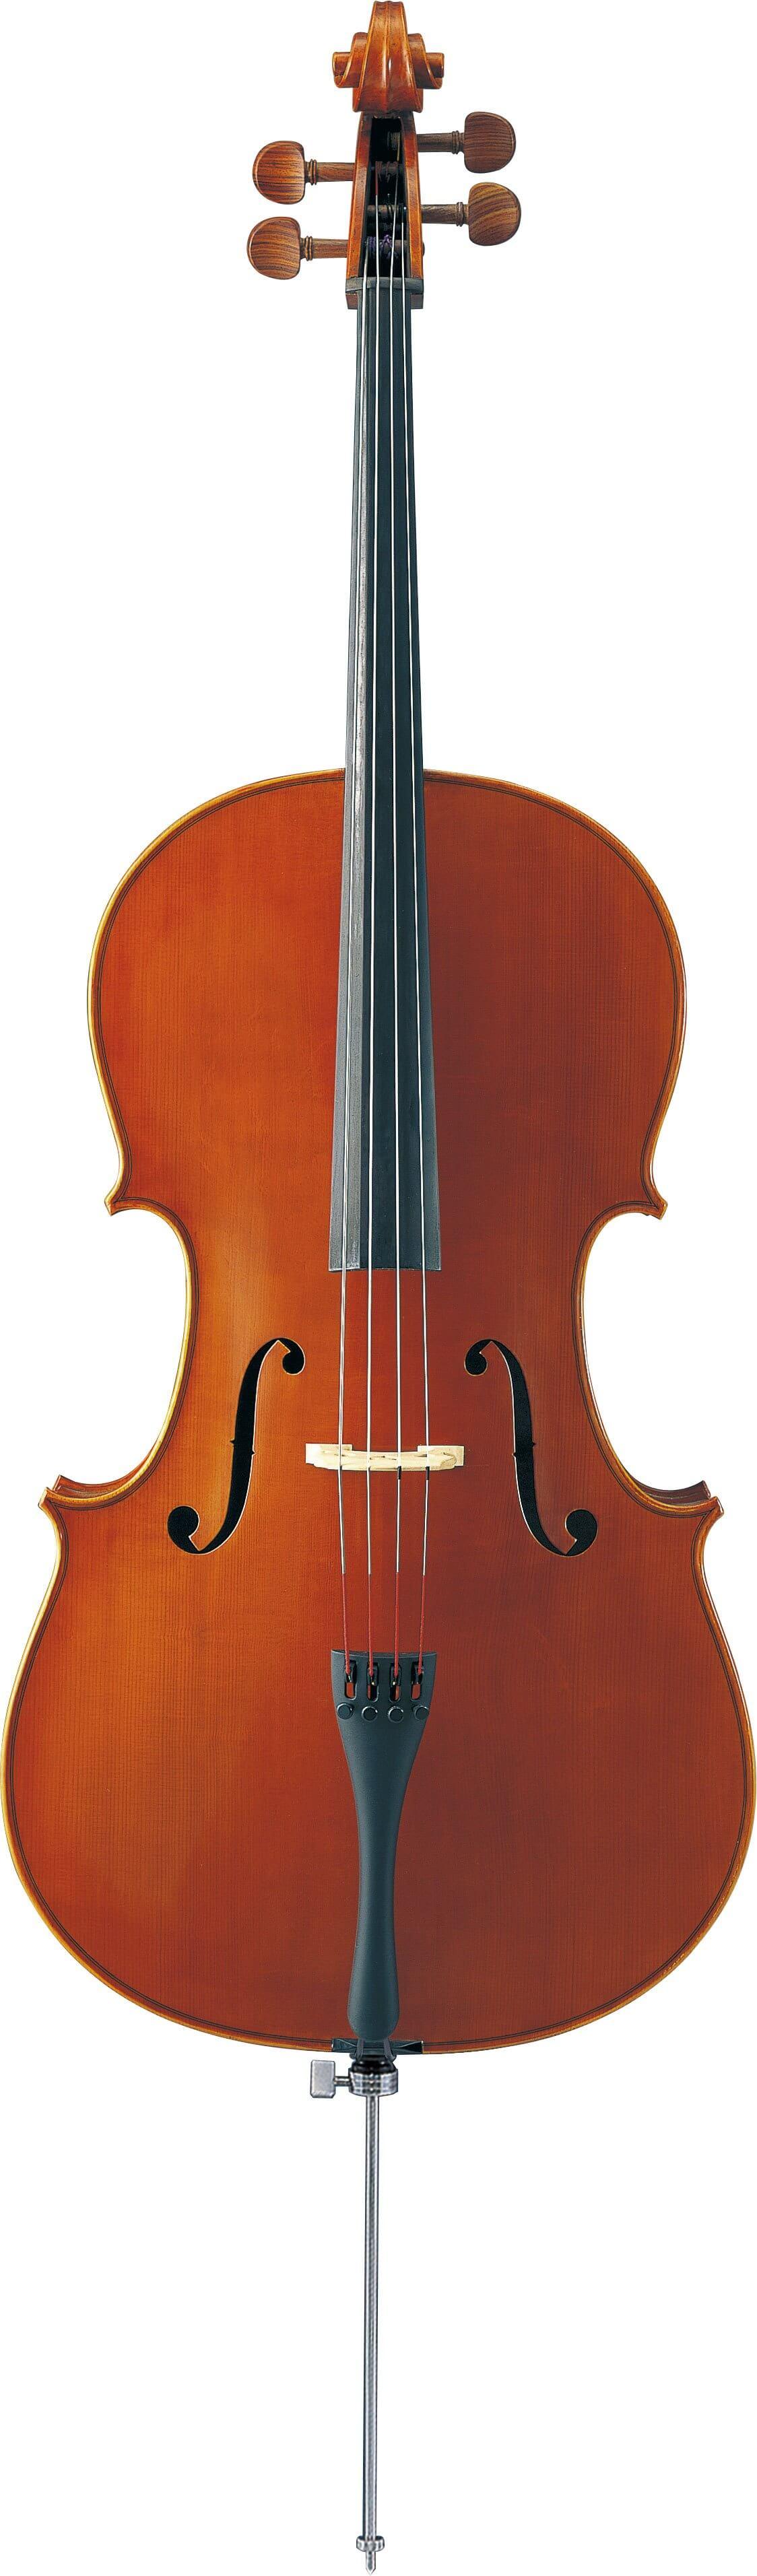 Violoncello Yamaha VC5S